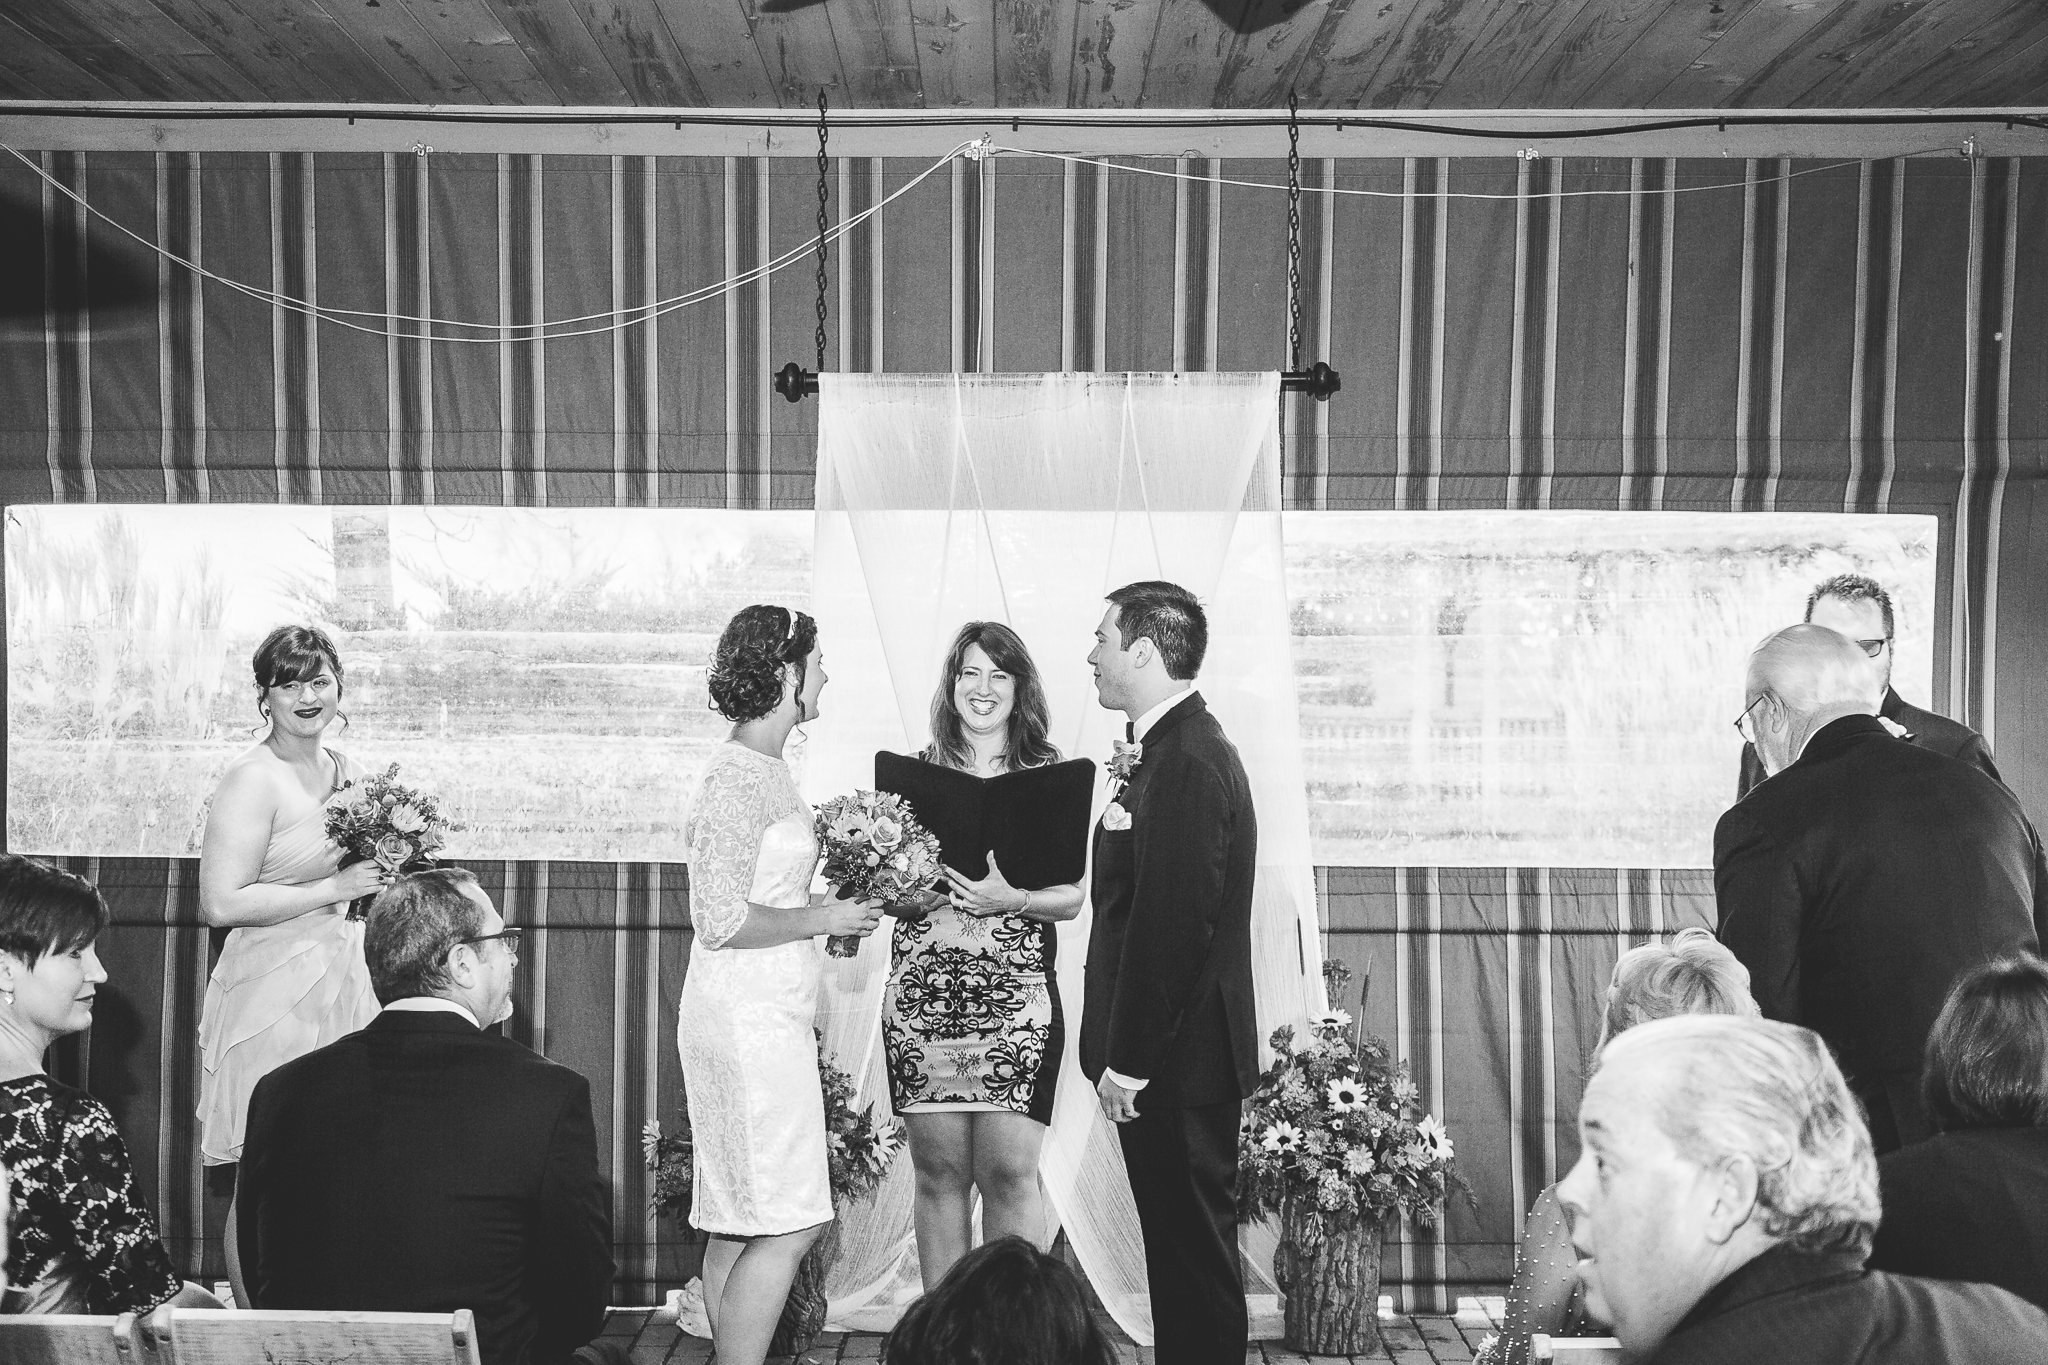 camuglia-whomstudio-chelsea_and_andy-nycphotographer-wedding-brooklyn-buffalo-timberlodge-073-5485.jpg